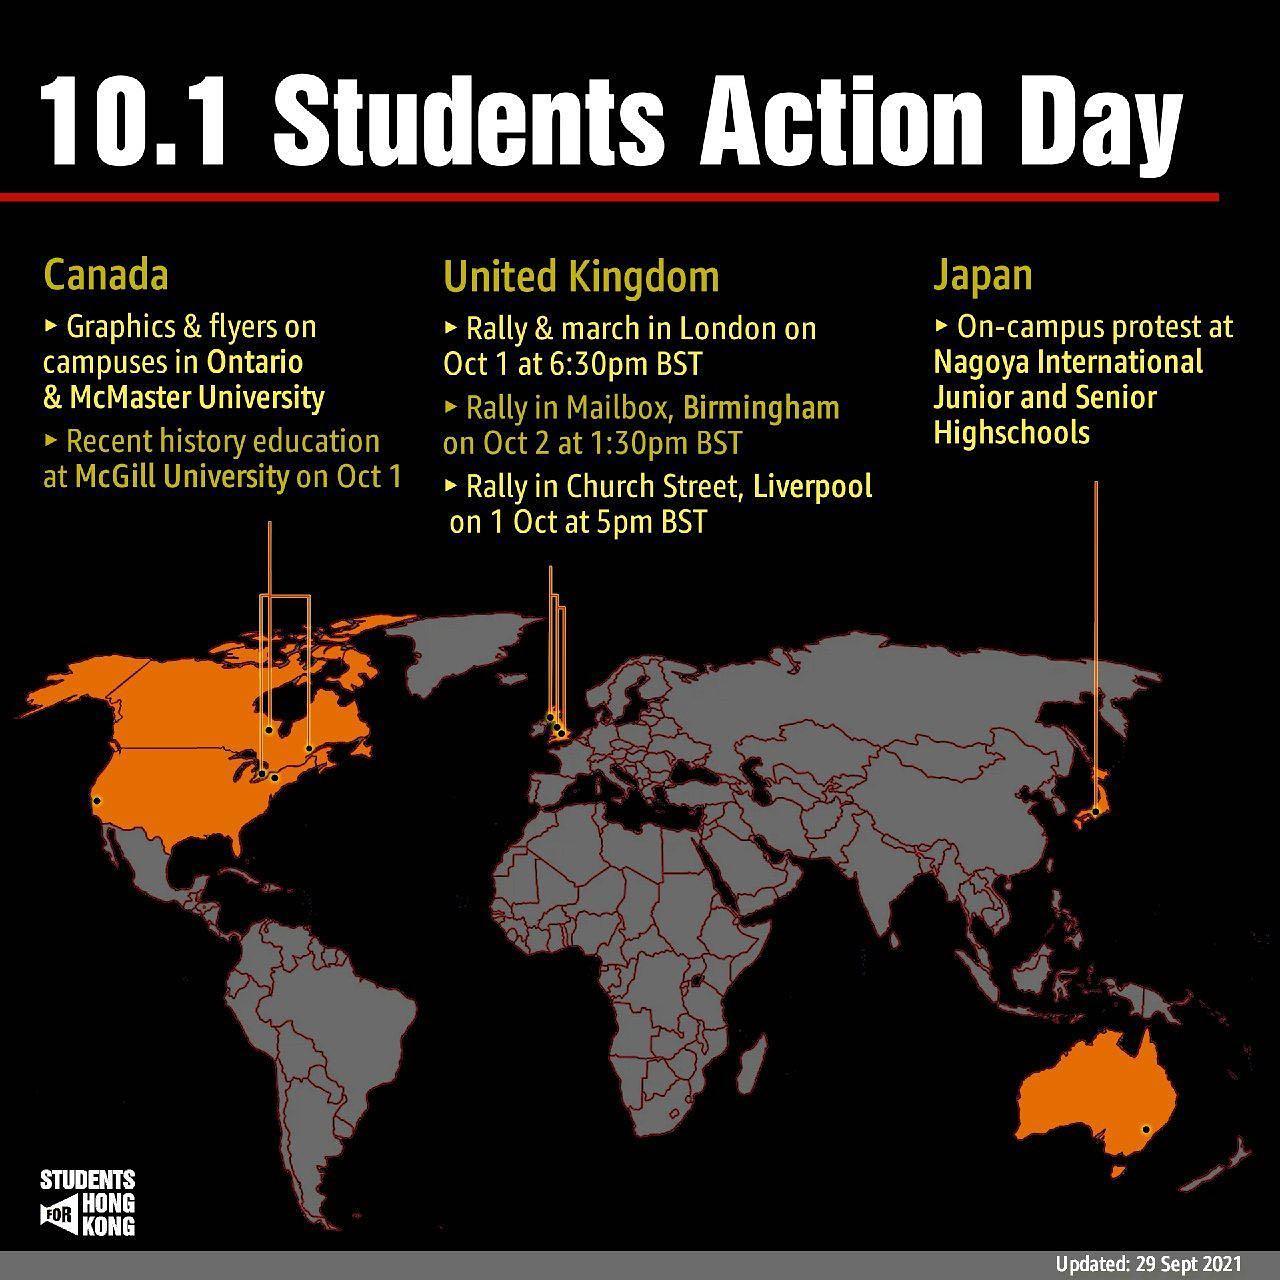 10.1 Students for Hong Kong Action Day